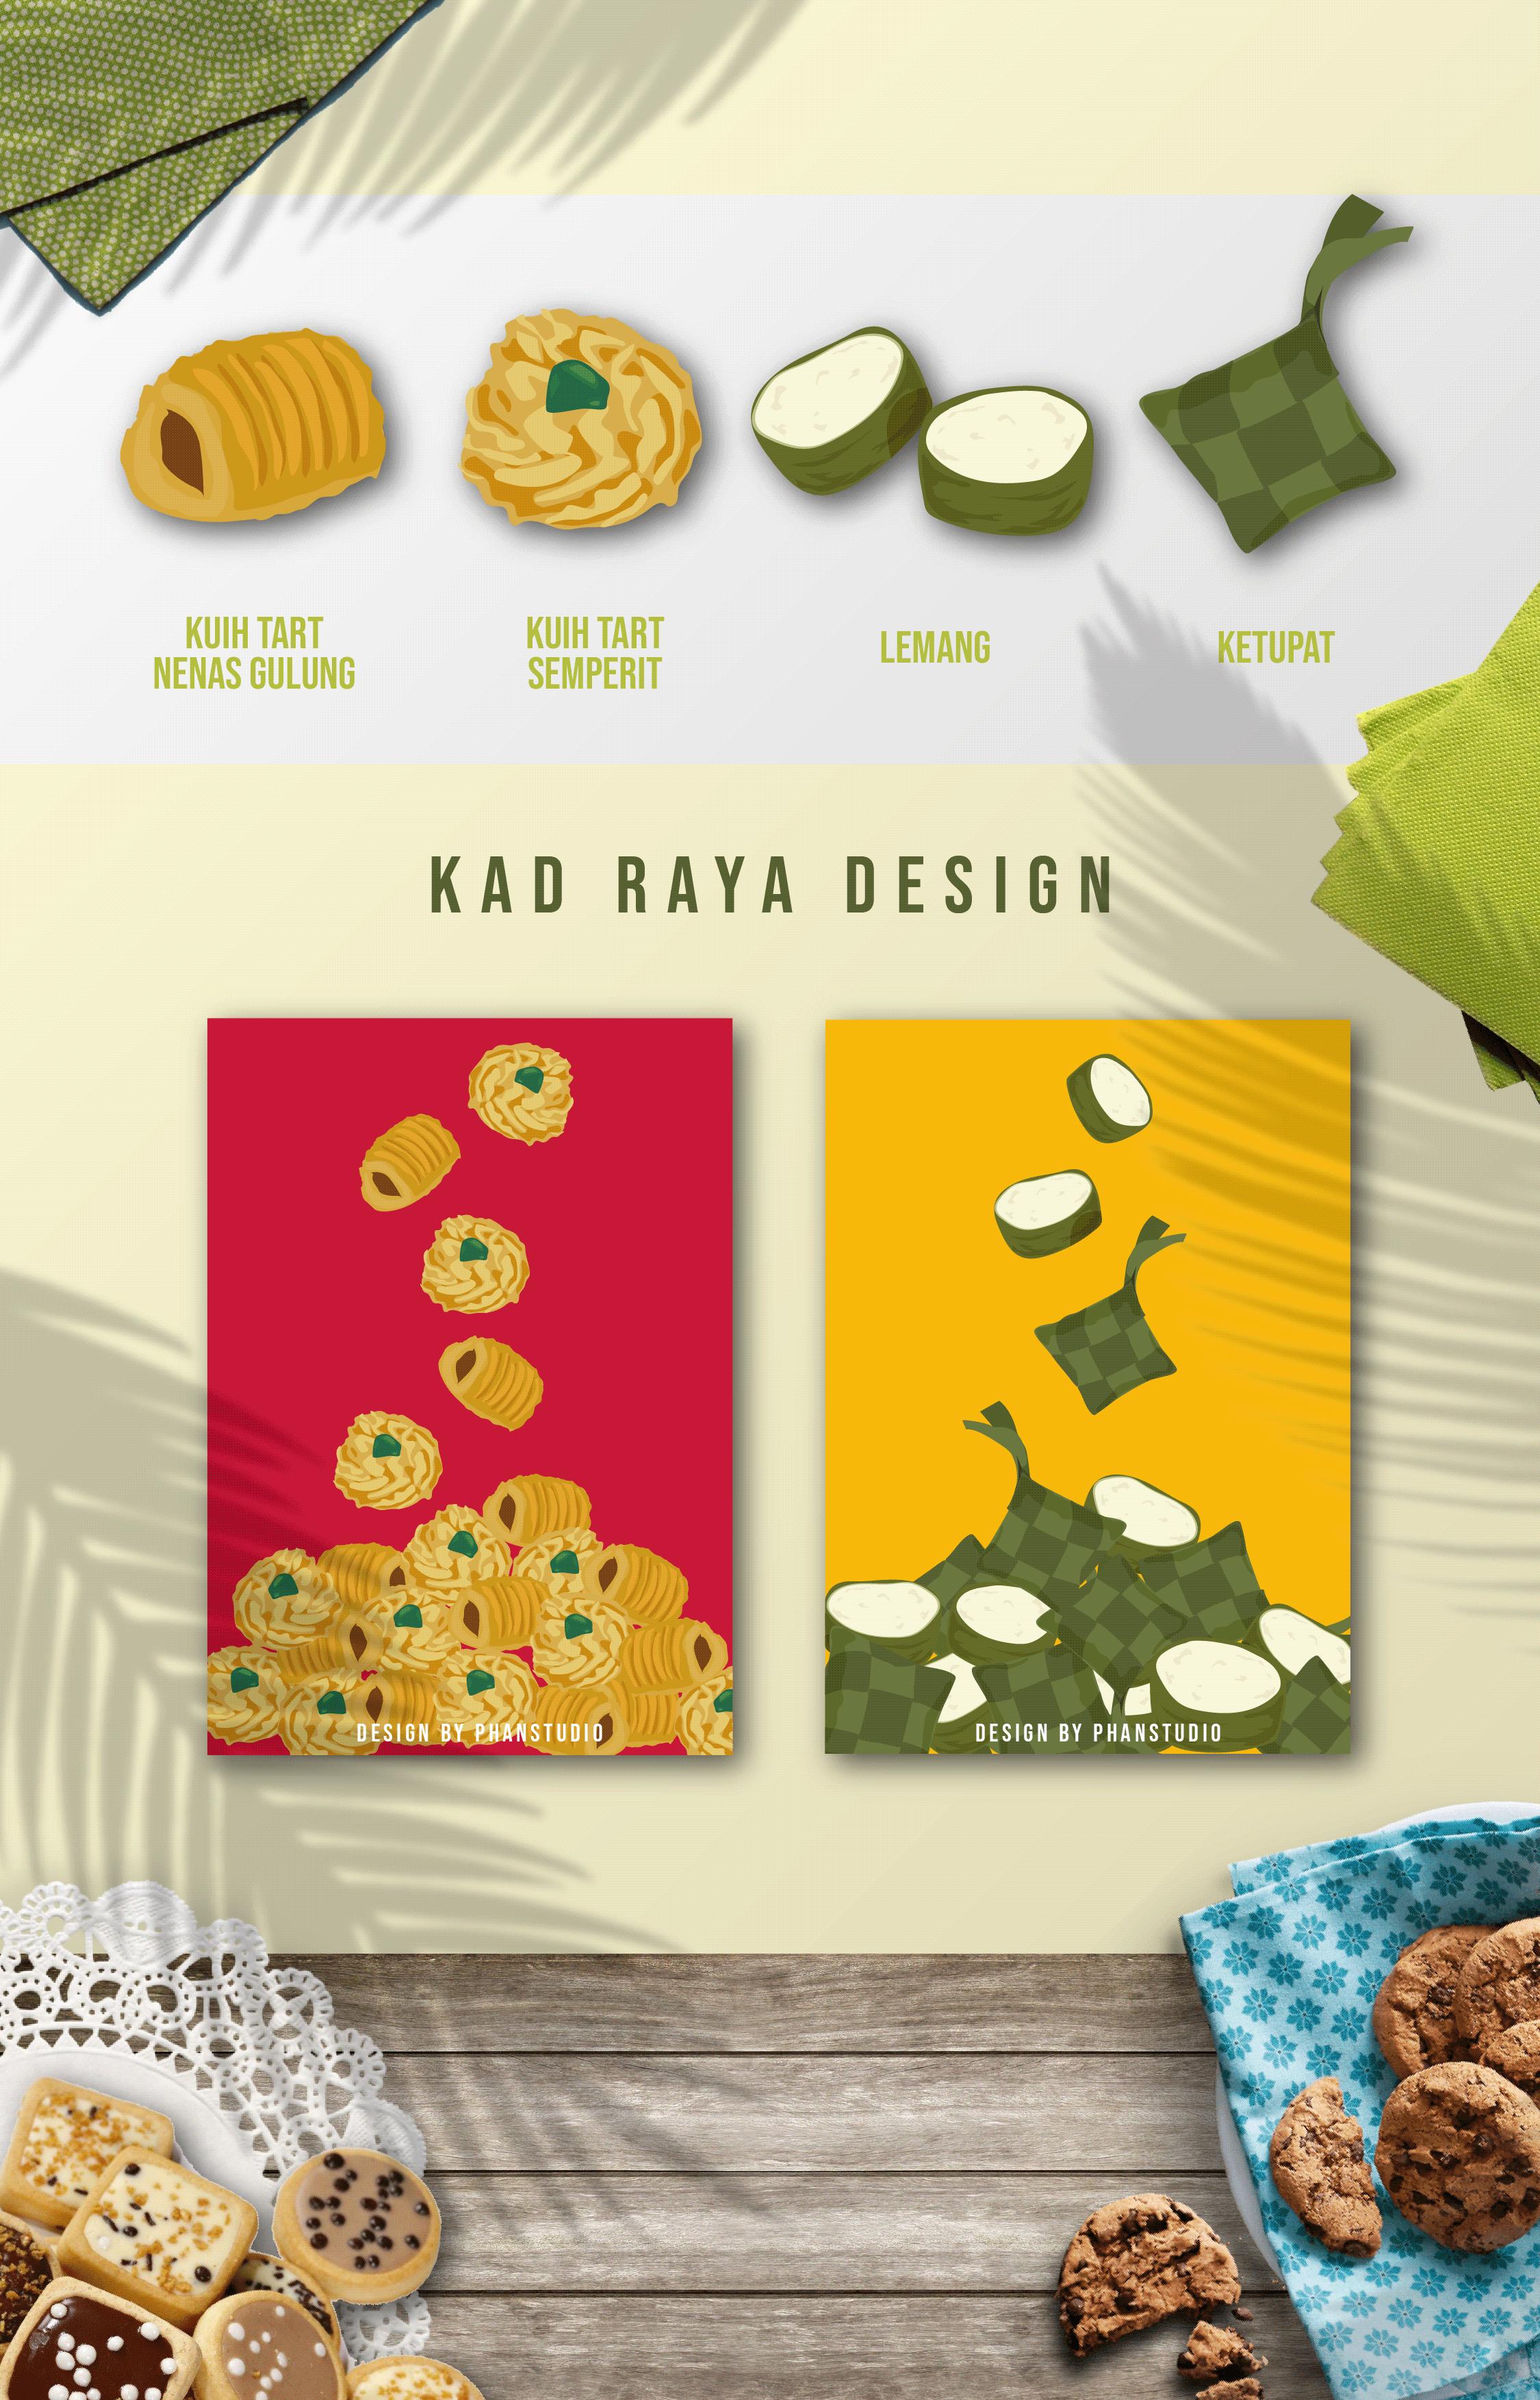 Kad Raya Projects Photos Videos Logos Illustrations And Branding On Behance